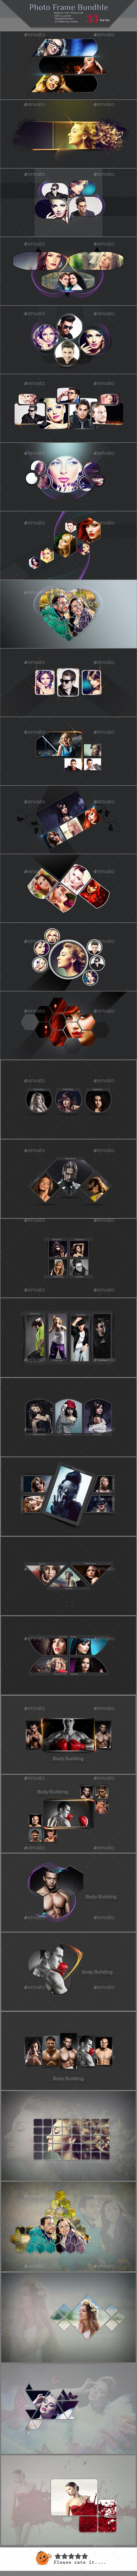 Photo Frame Bundle  - Photo Templates Graphics